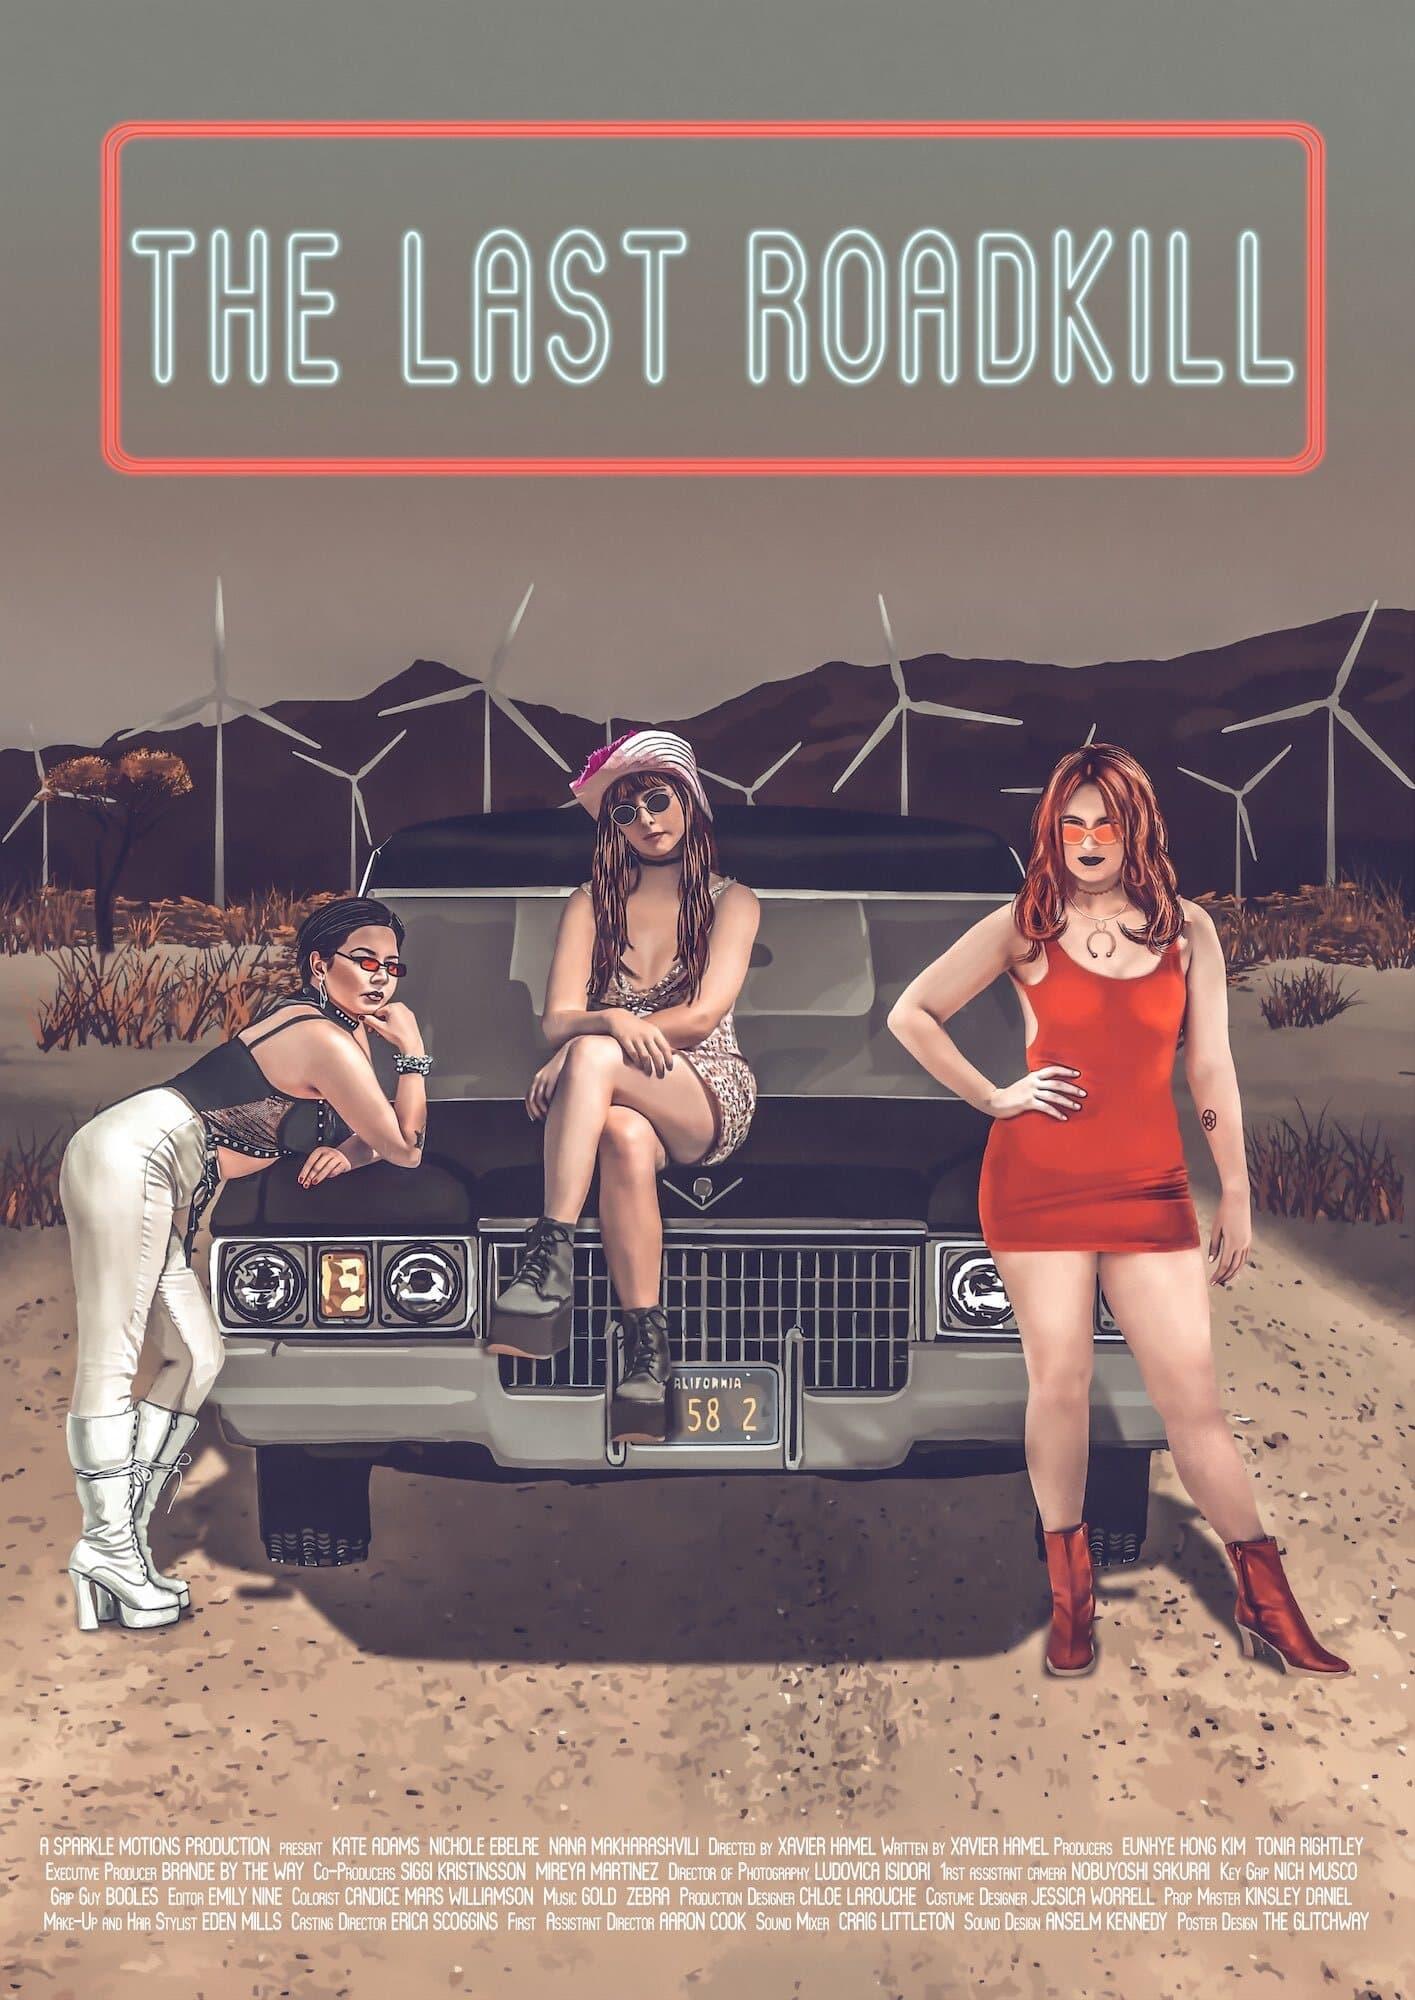 The Last Roadkill